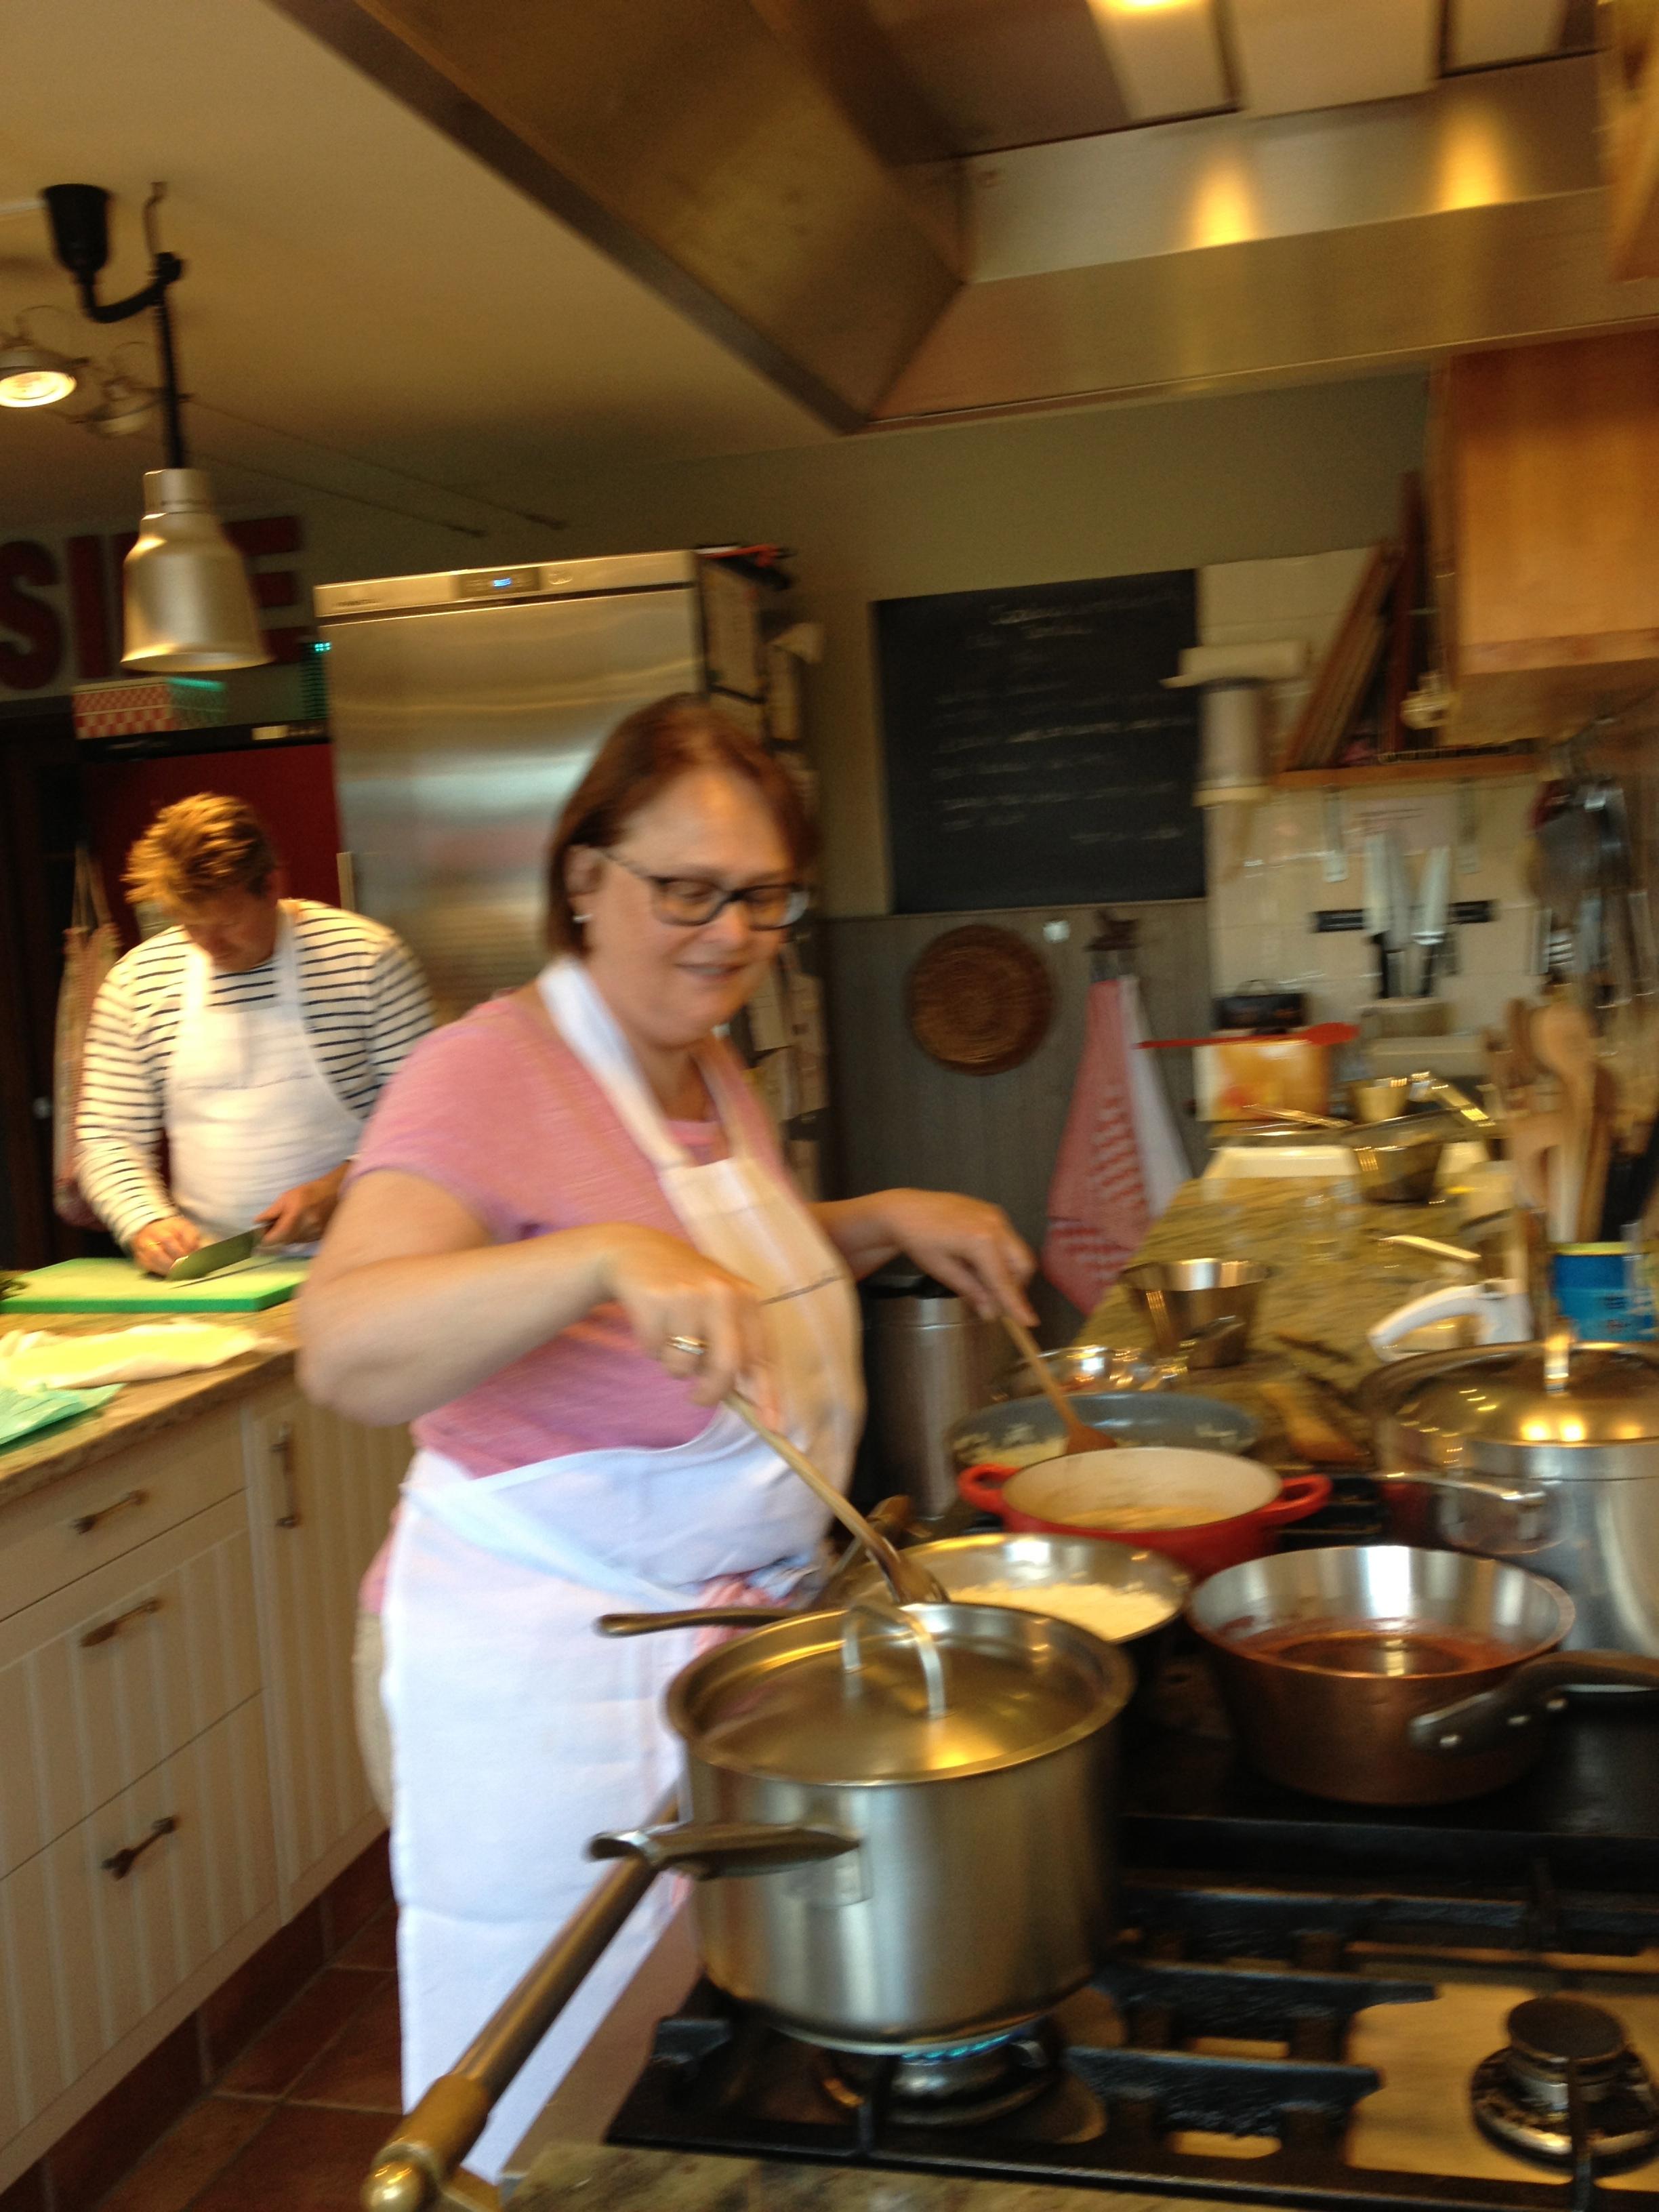 Taller de cocina la maison blanche aux volets bleus 39 blog for Taller de cocina teruel